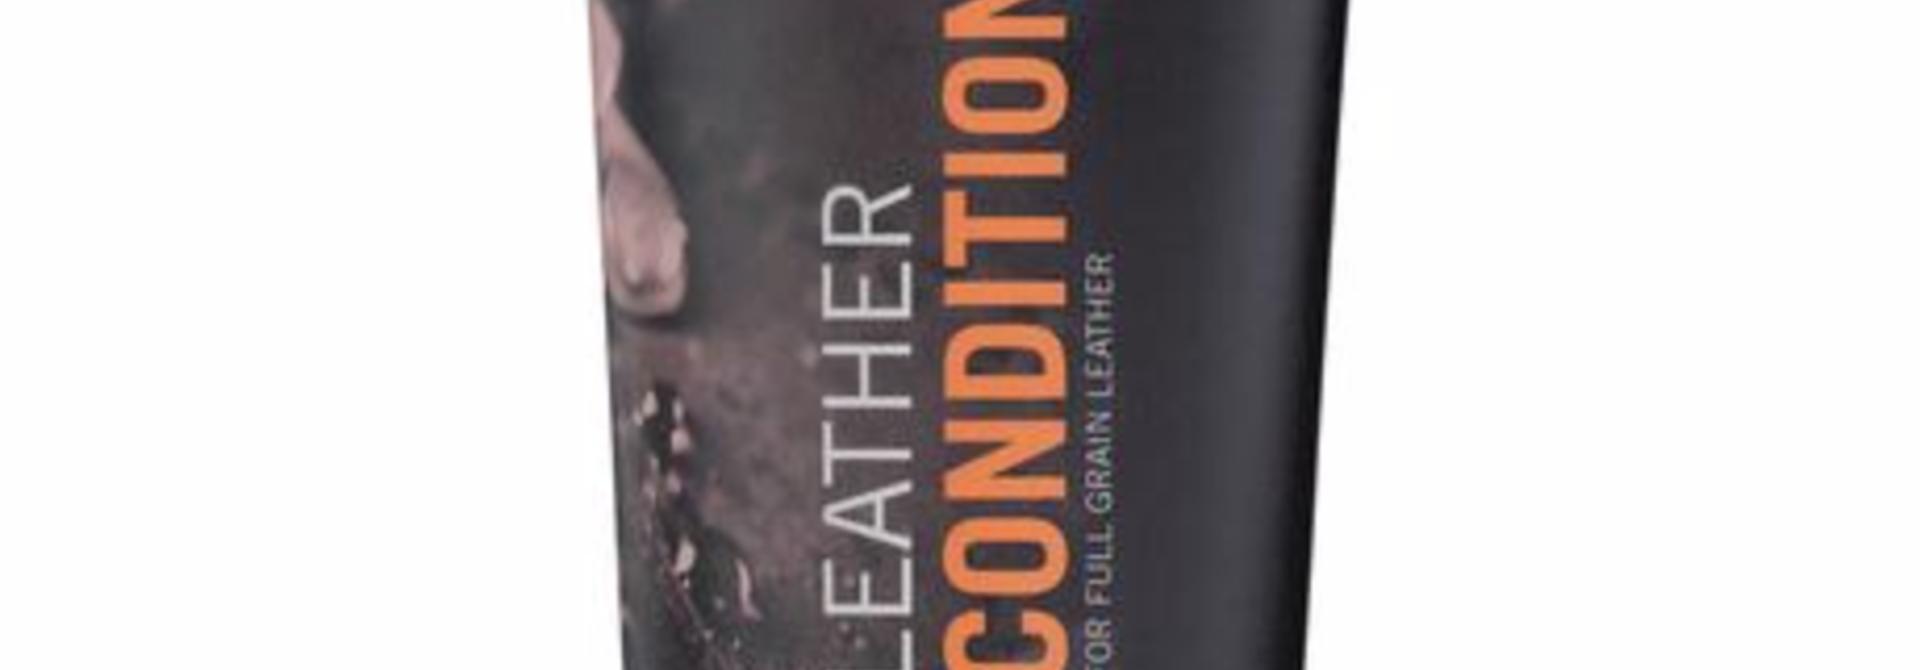 Leather Conditioner 75ml